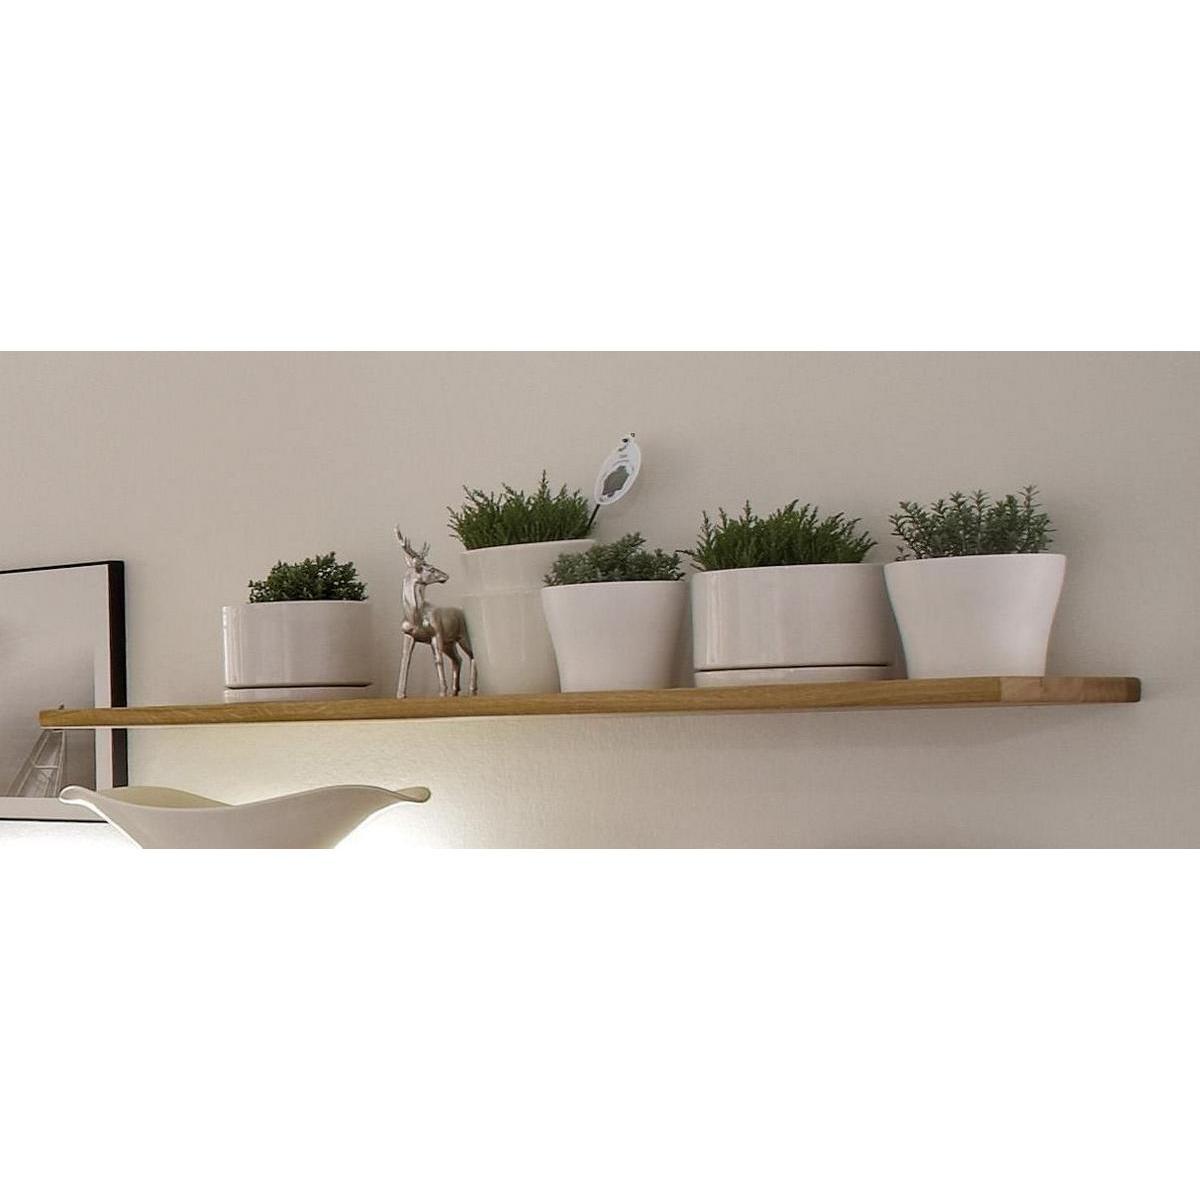 wandregal buche massiv massivholz wandregal buche massiv natur ge lt casera wandboard 60 cm. Black Bedroom Furniture Sets. Home Design Ideas